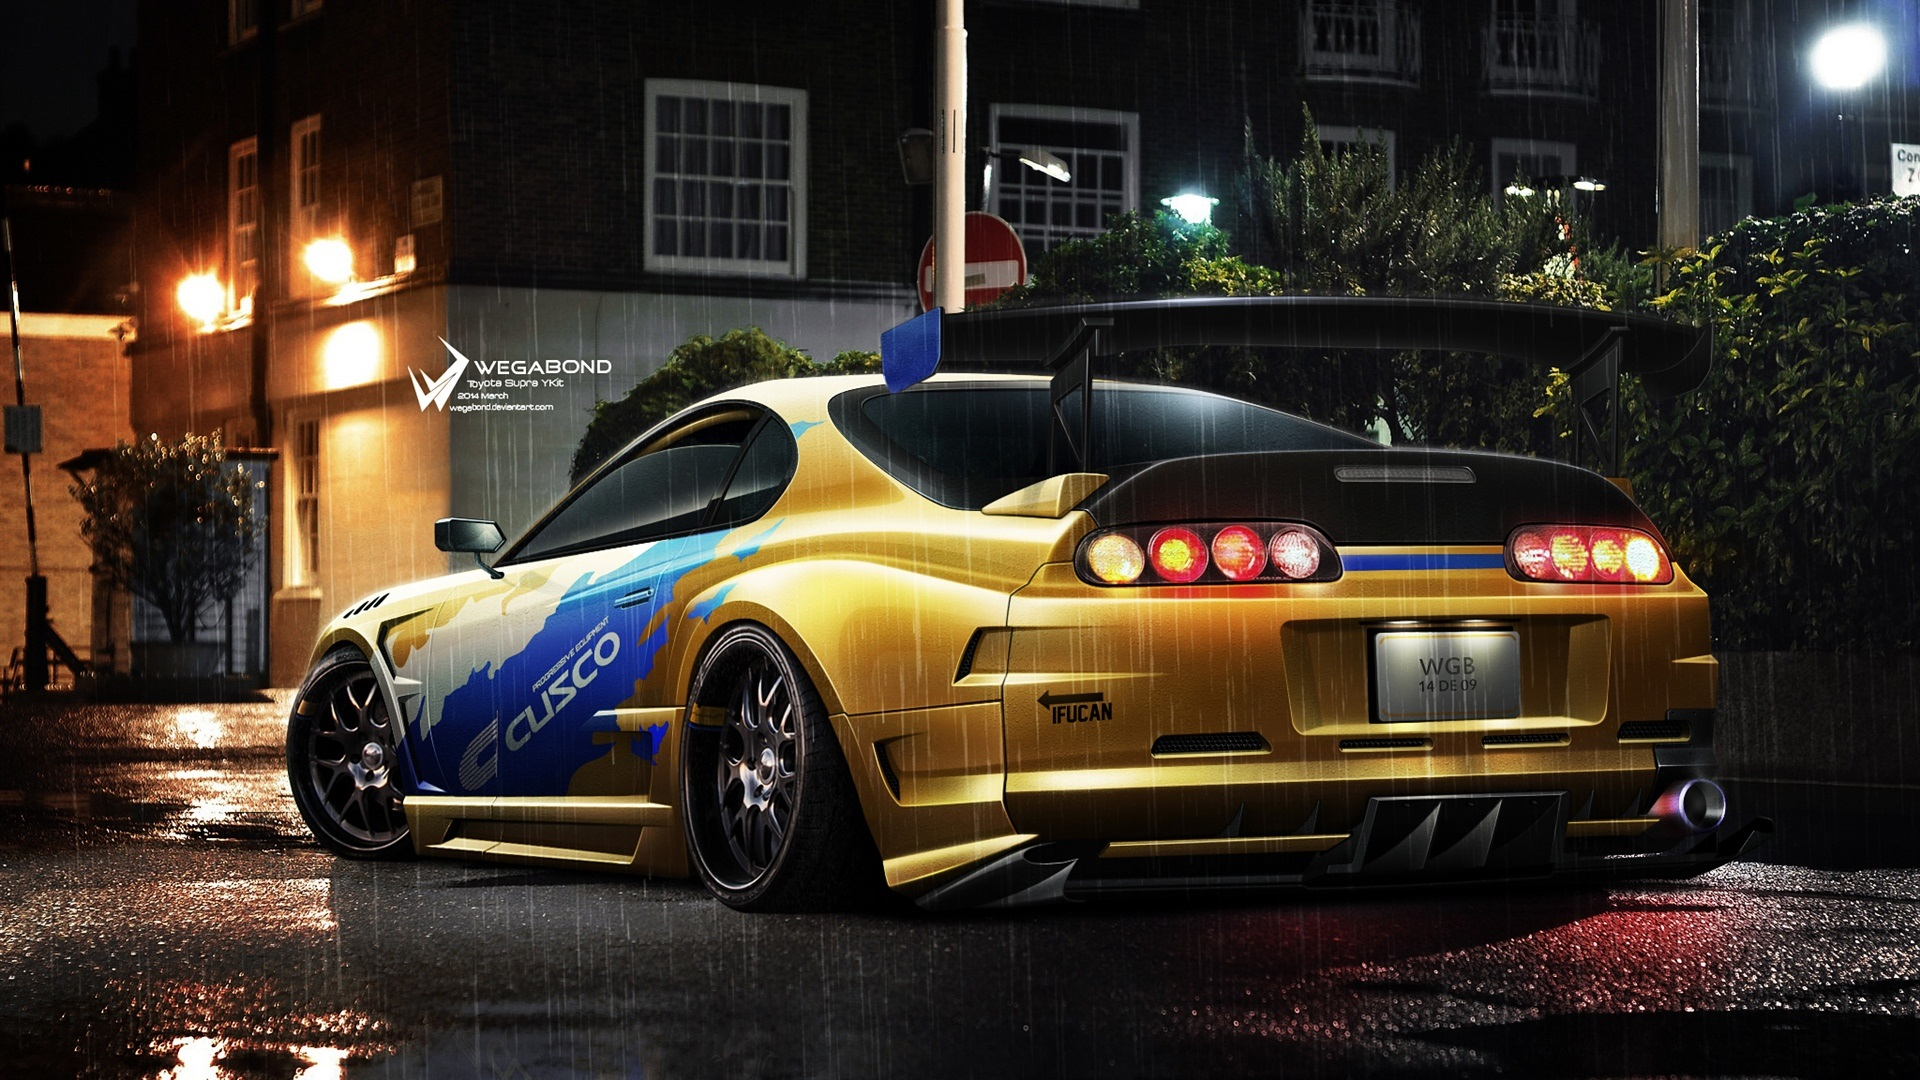 Wallpaper Toyota yellow race car, lights, night, rain 1920x1080 Full